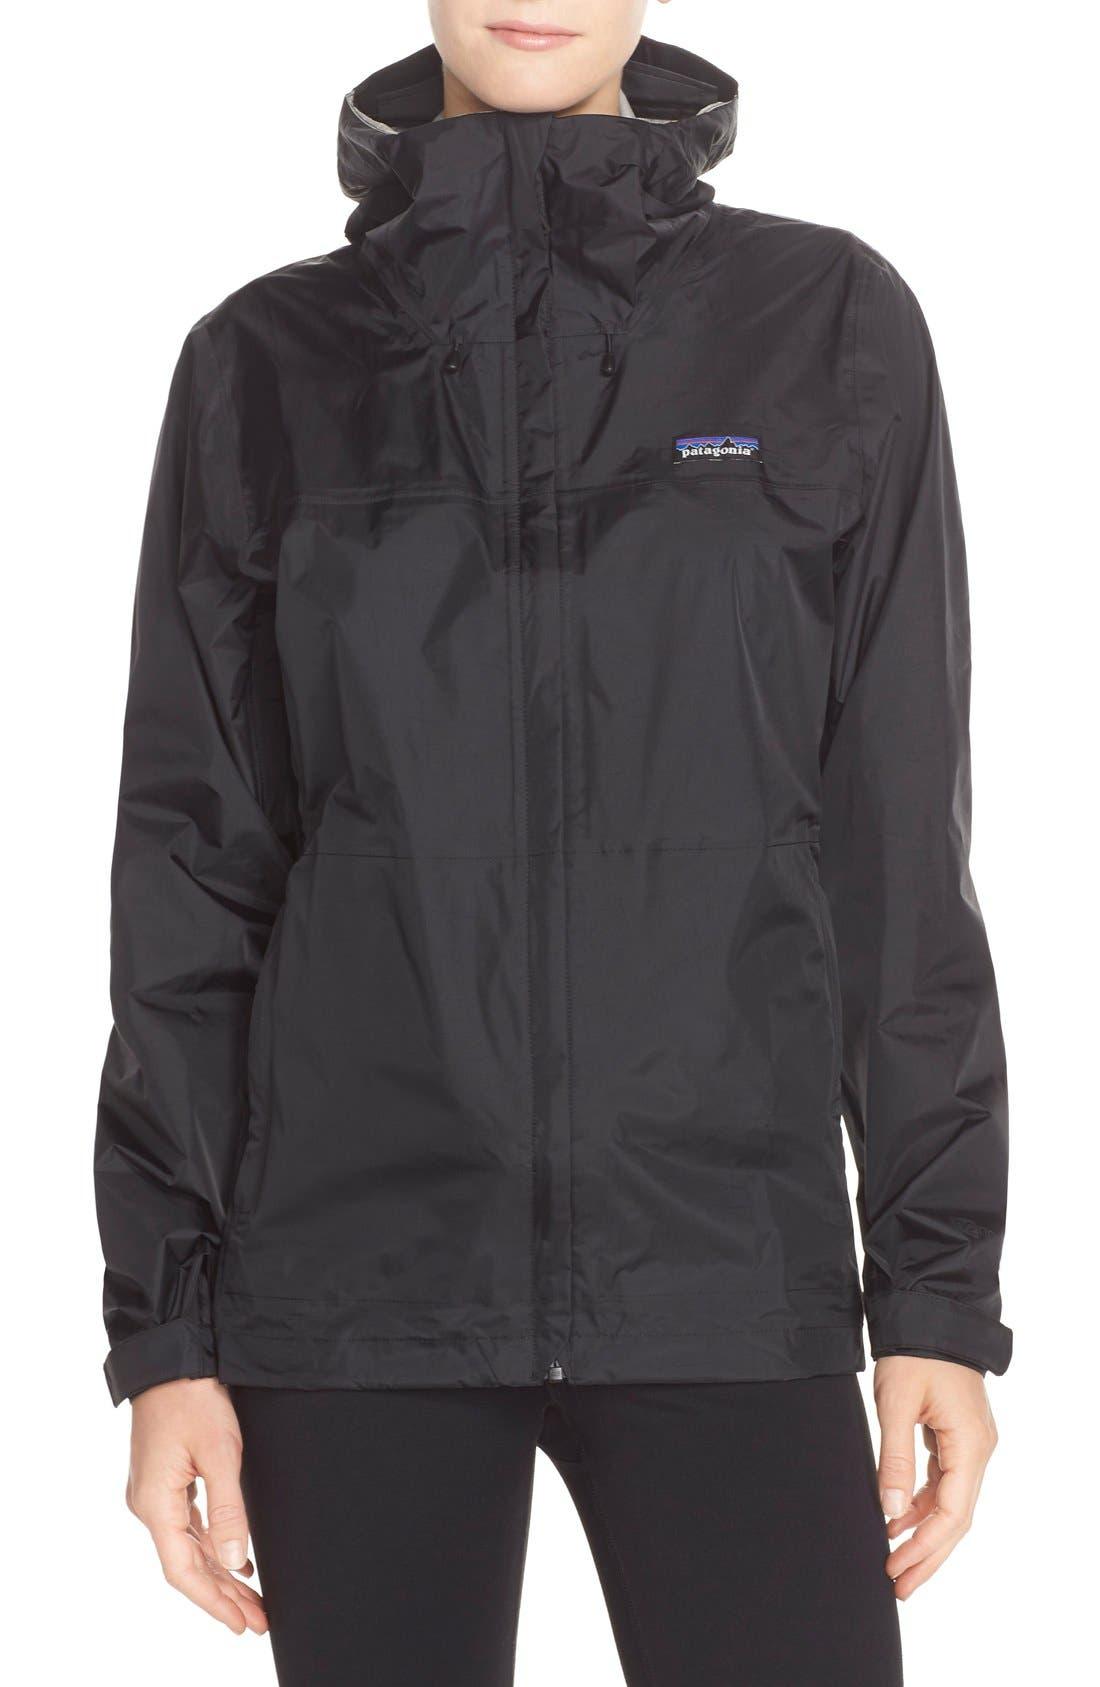 PATAGONIA, Torrentshell Jacket, Main thumbnail 1, color, BLACK